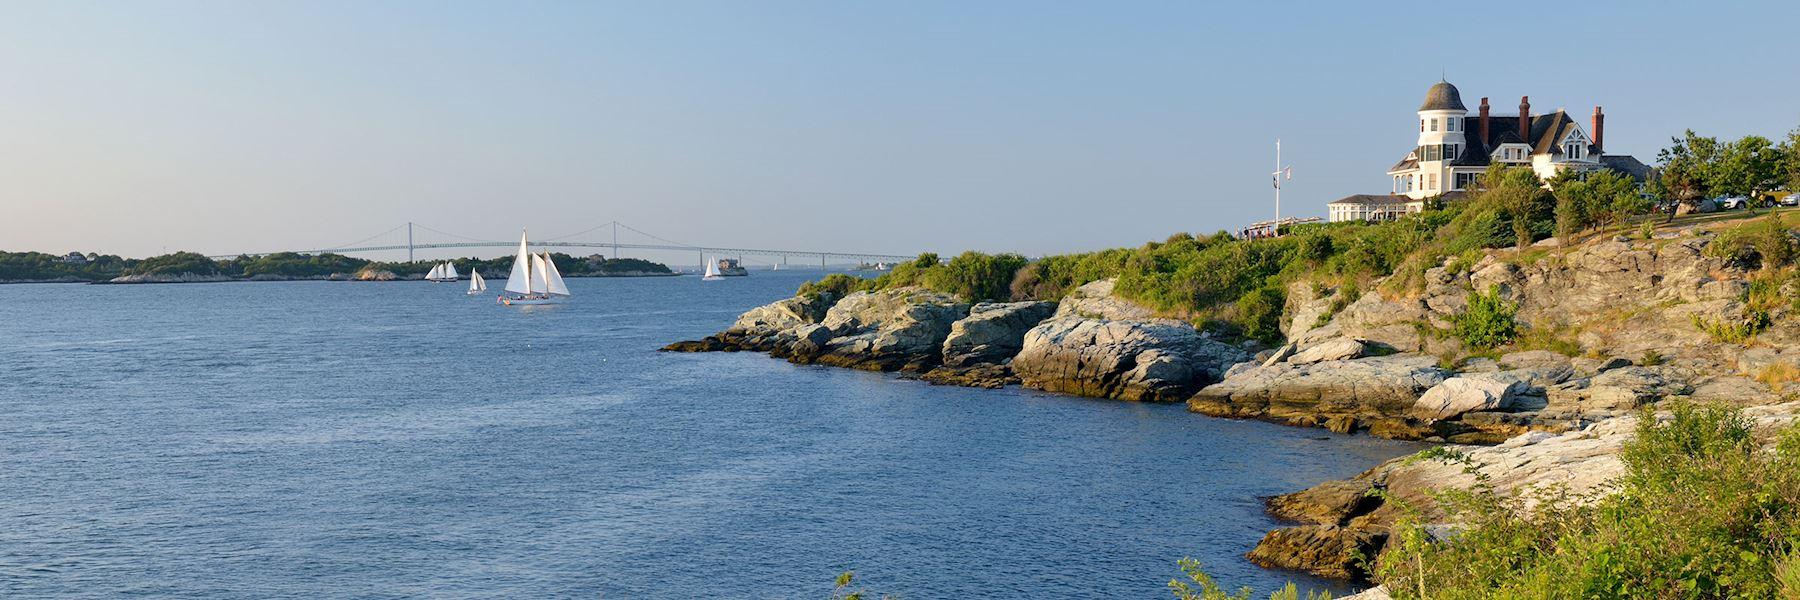 Visit Newport, Rhode Island, New England